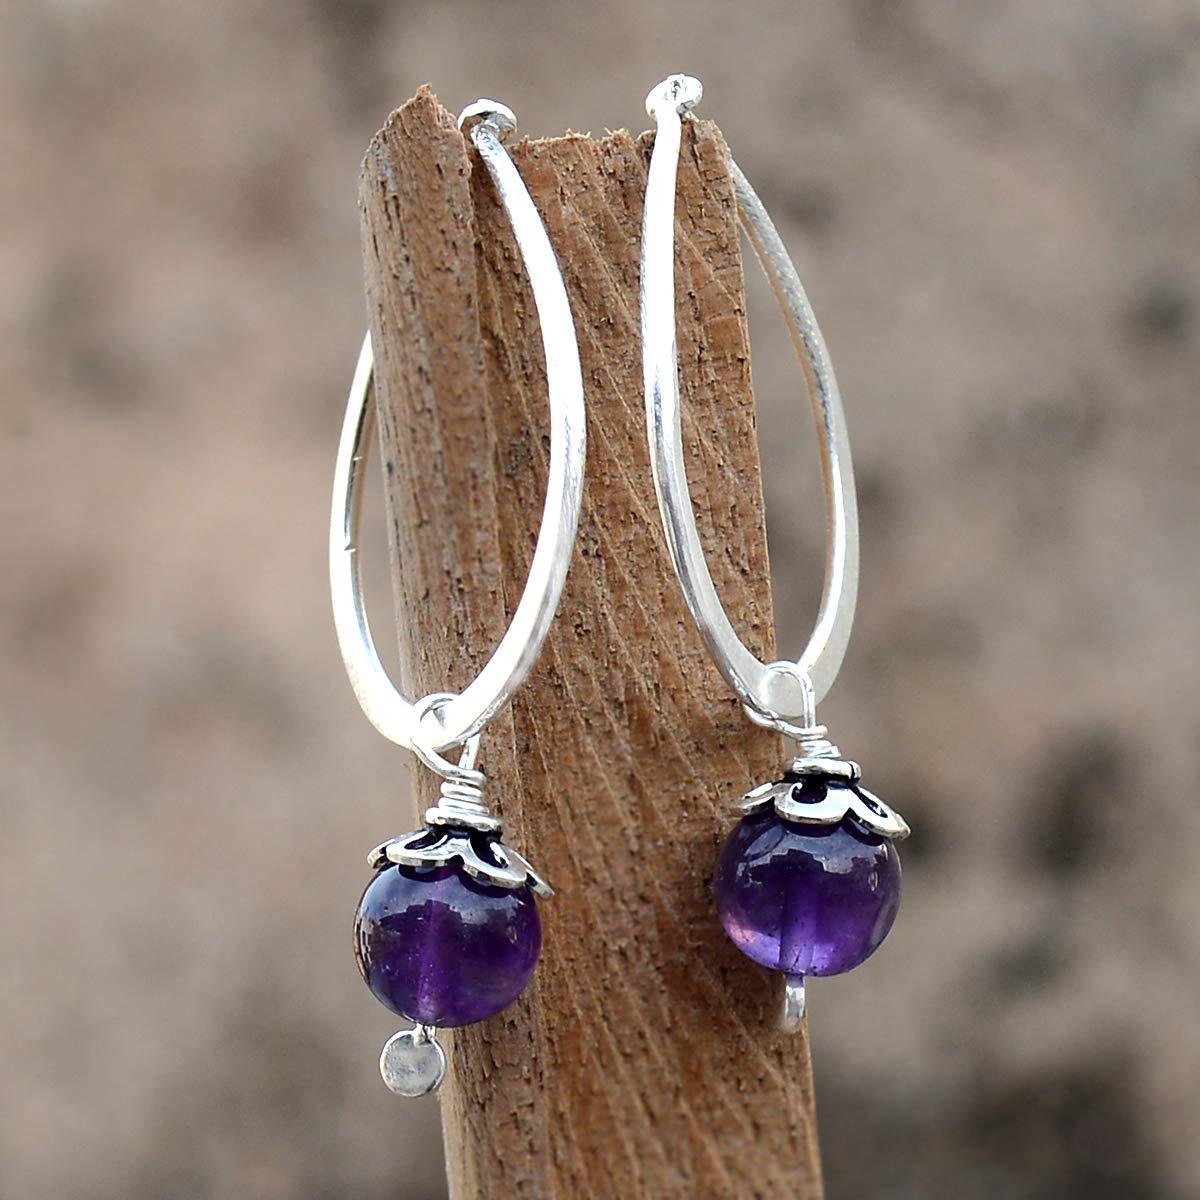 Saamarth Impex Amethyst Gemstone 925 Sterling Silver Earring PG-156045